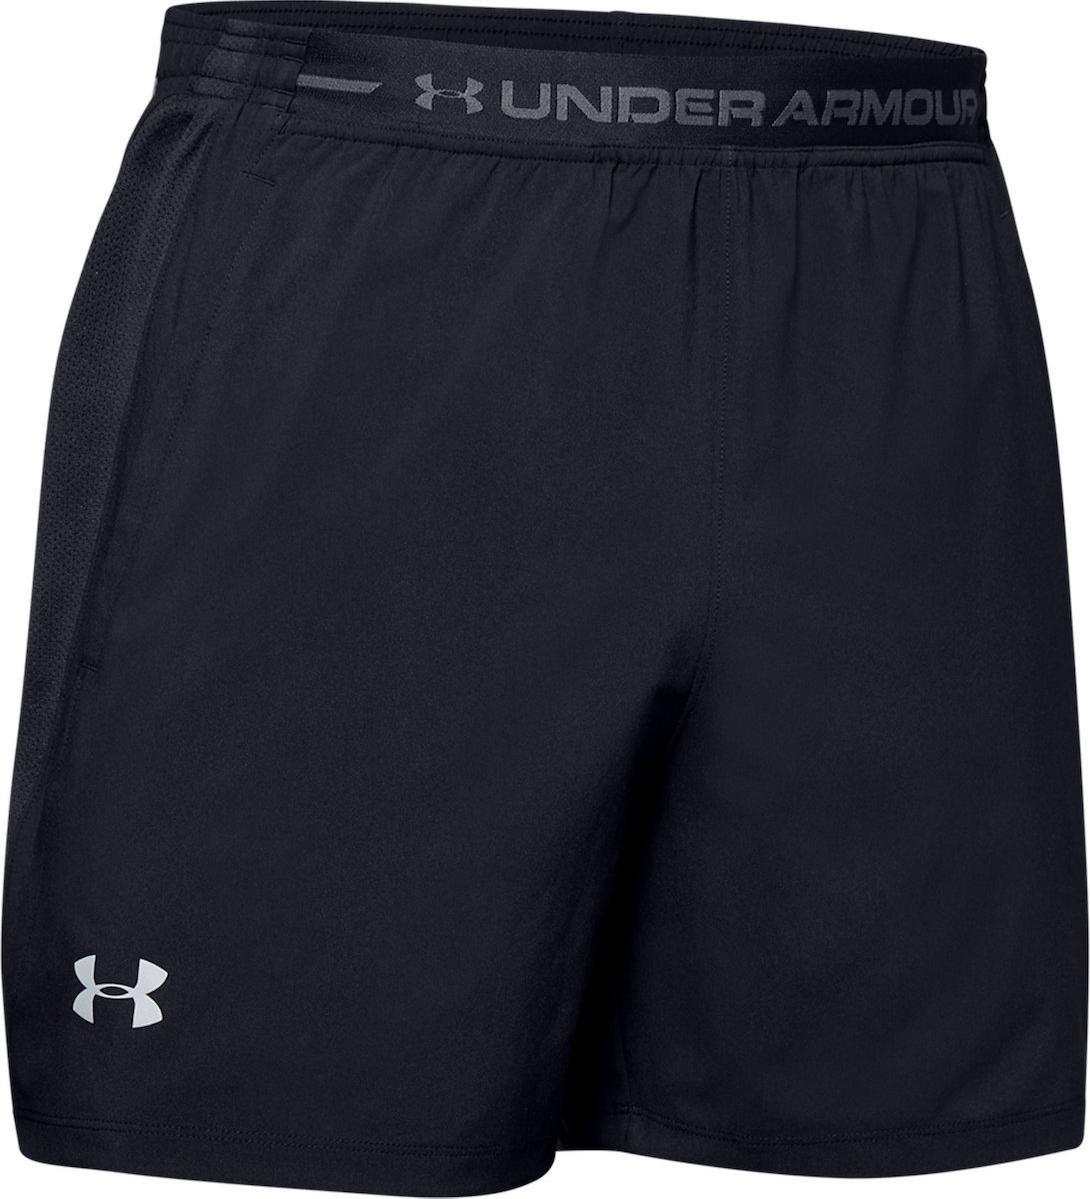 Pantalón corto Under Armour UA LAUNCH SW 5 EXPOSED SHORT